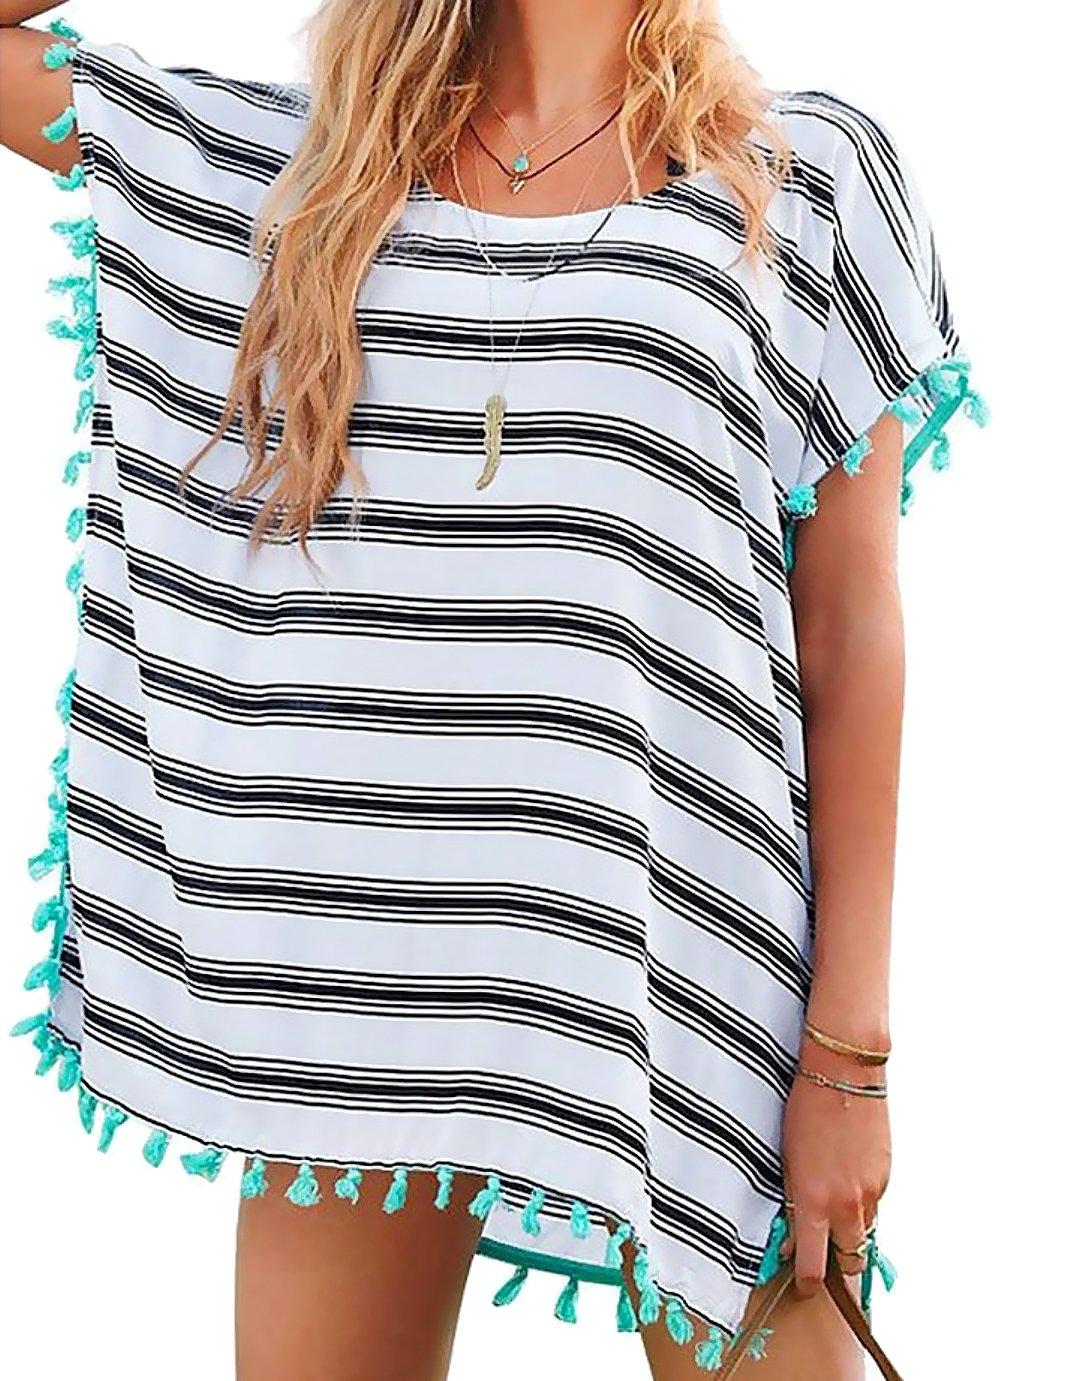 Chalier Womens Striped Chiffon Swimwear Bikini Swim Beachwear Swimsuit Cover up,A-white Stripe,One Size